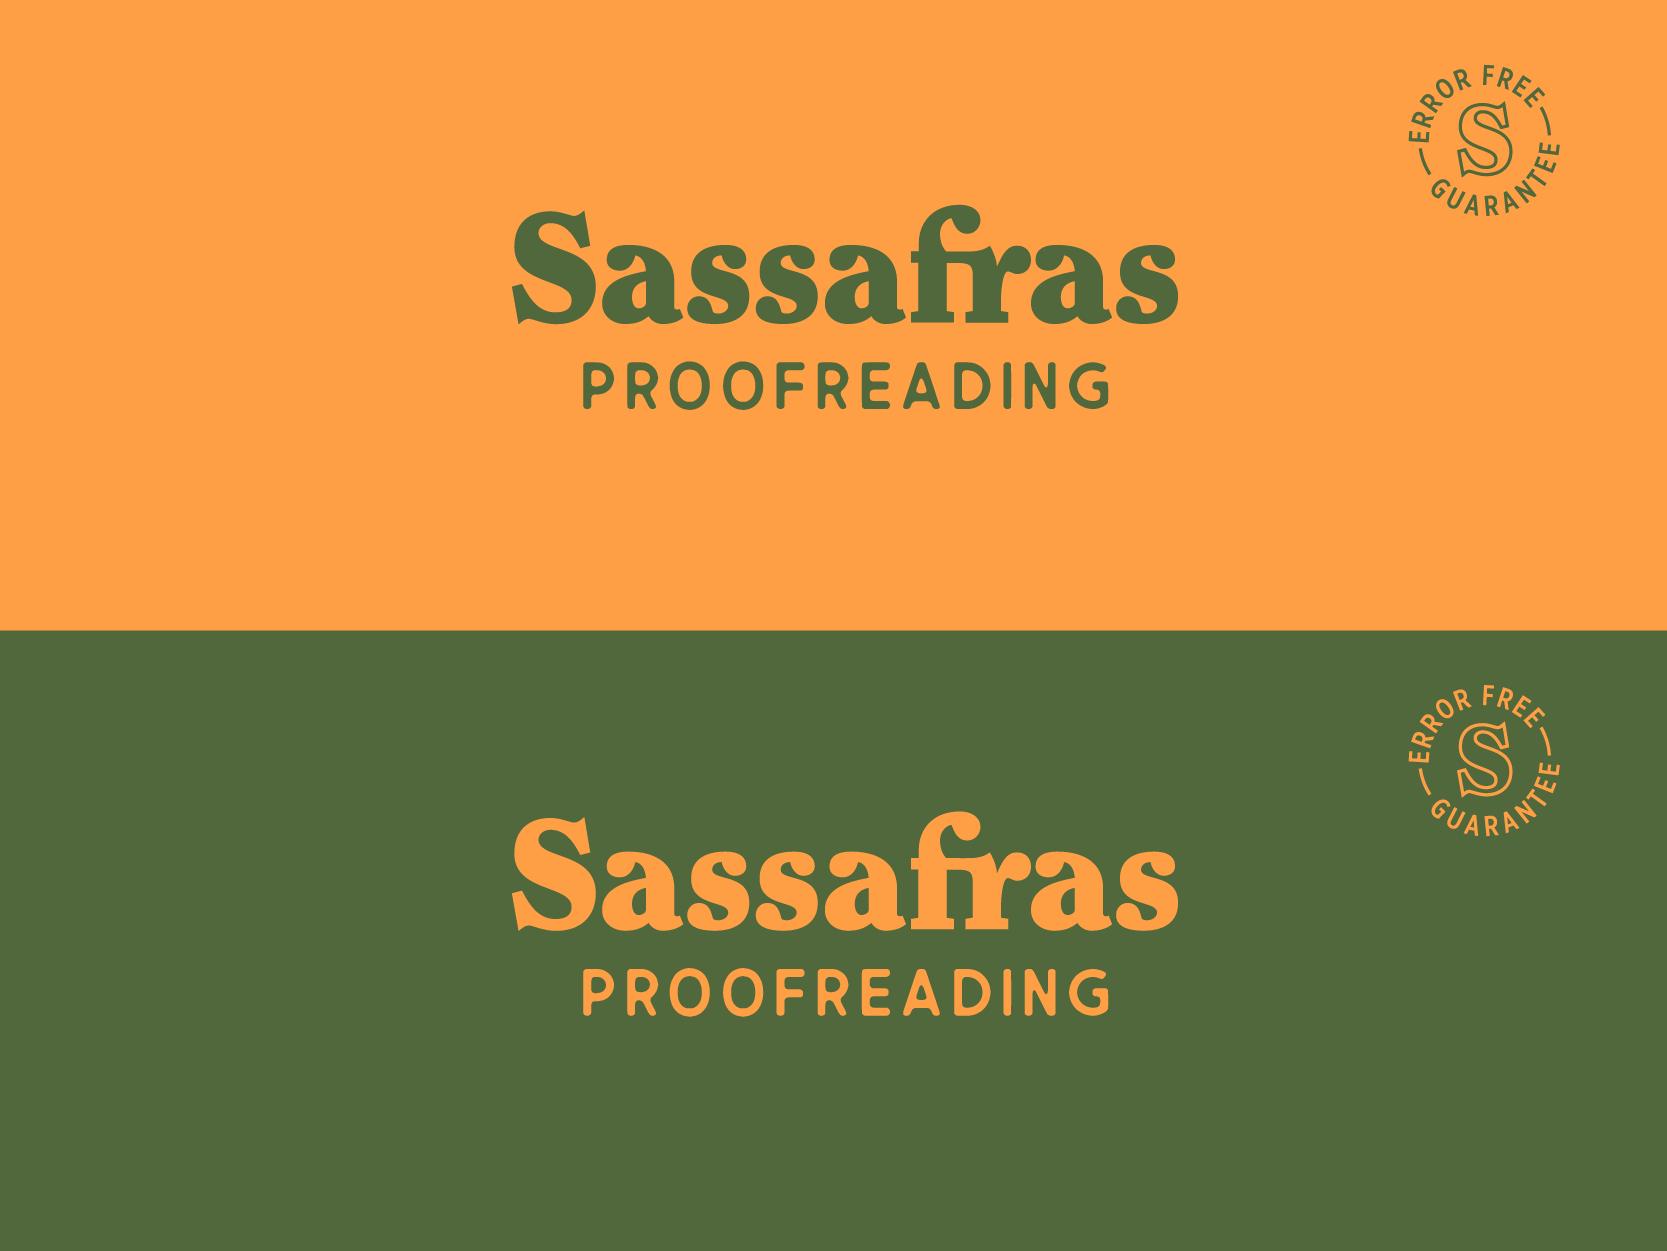 SASSAFRAS-08.png